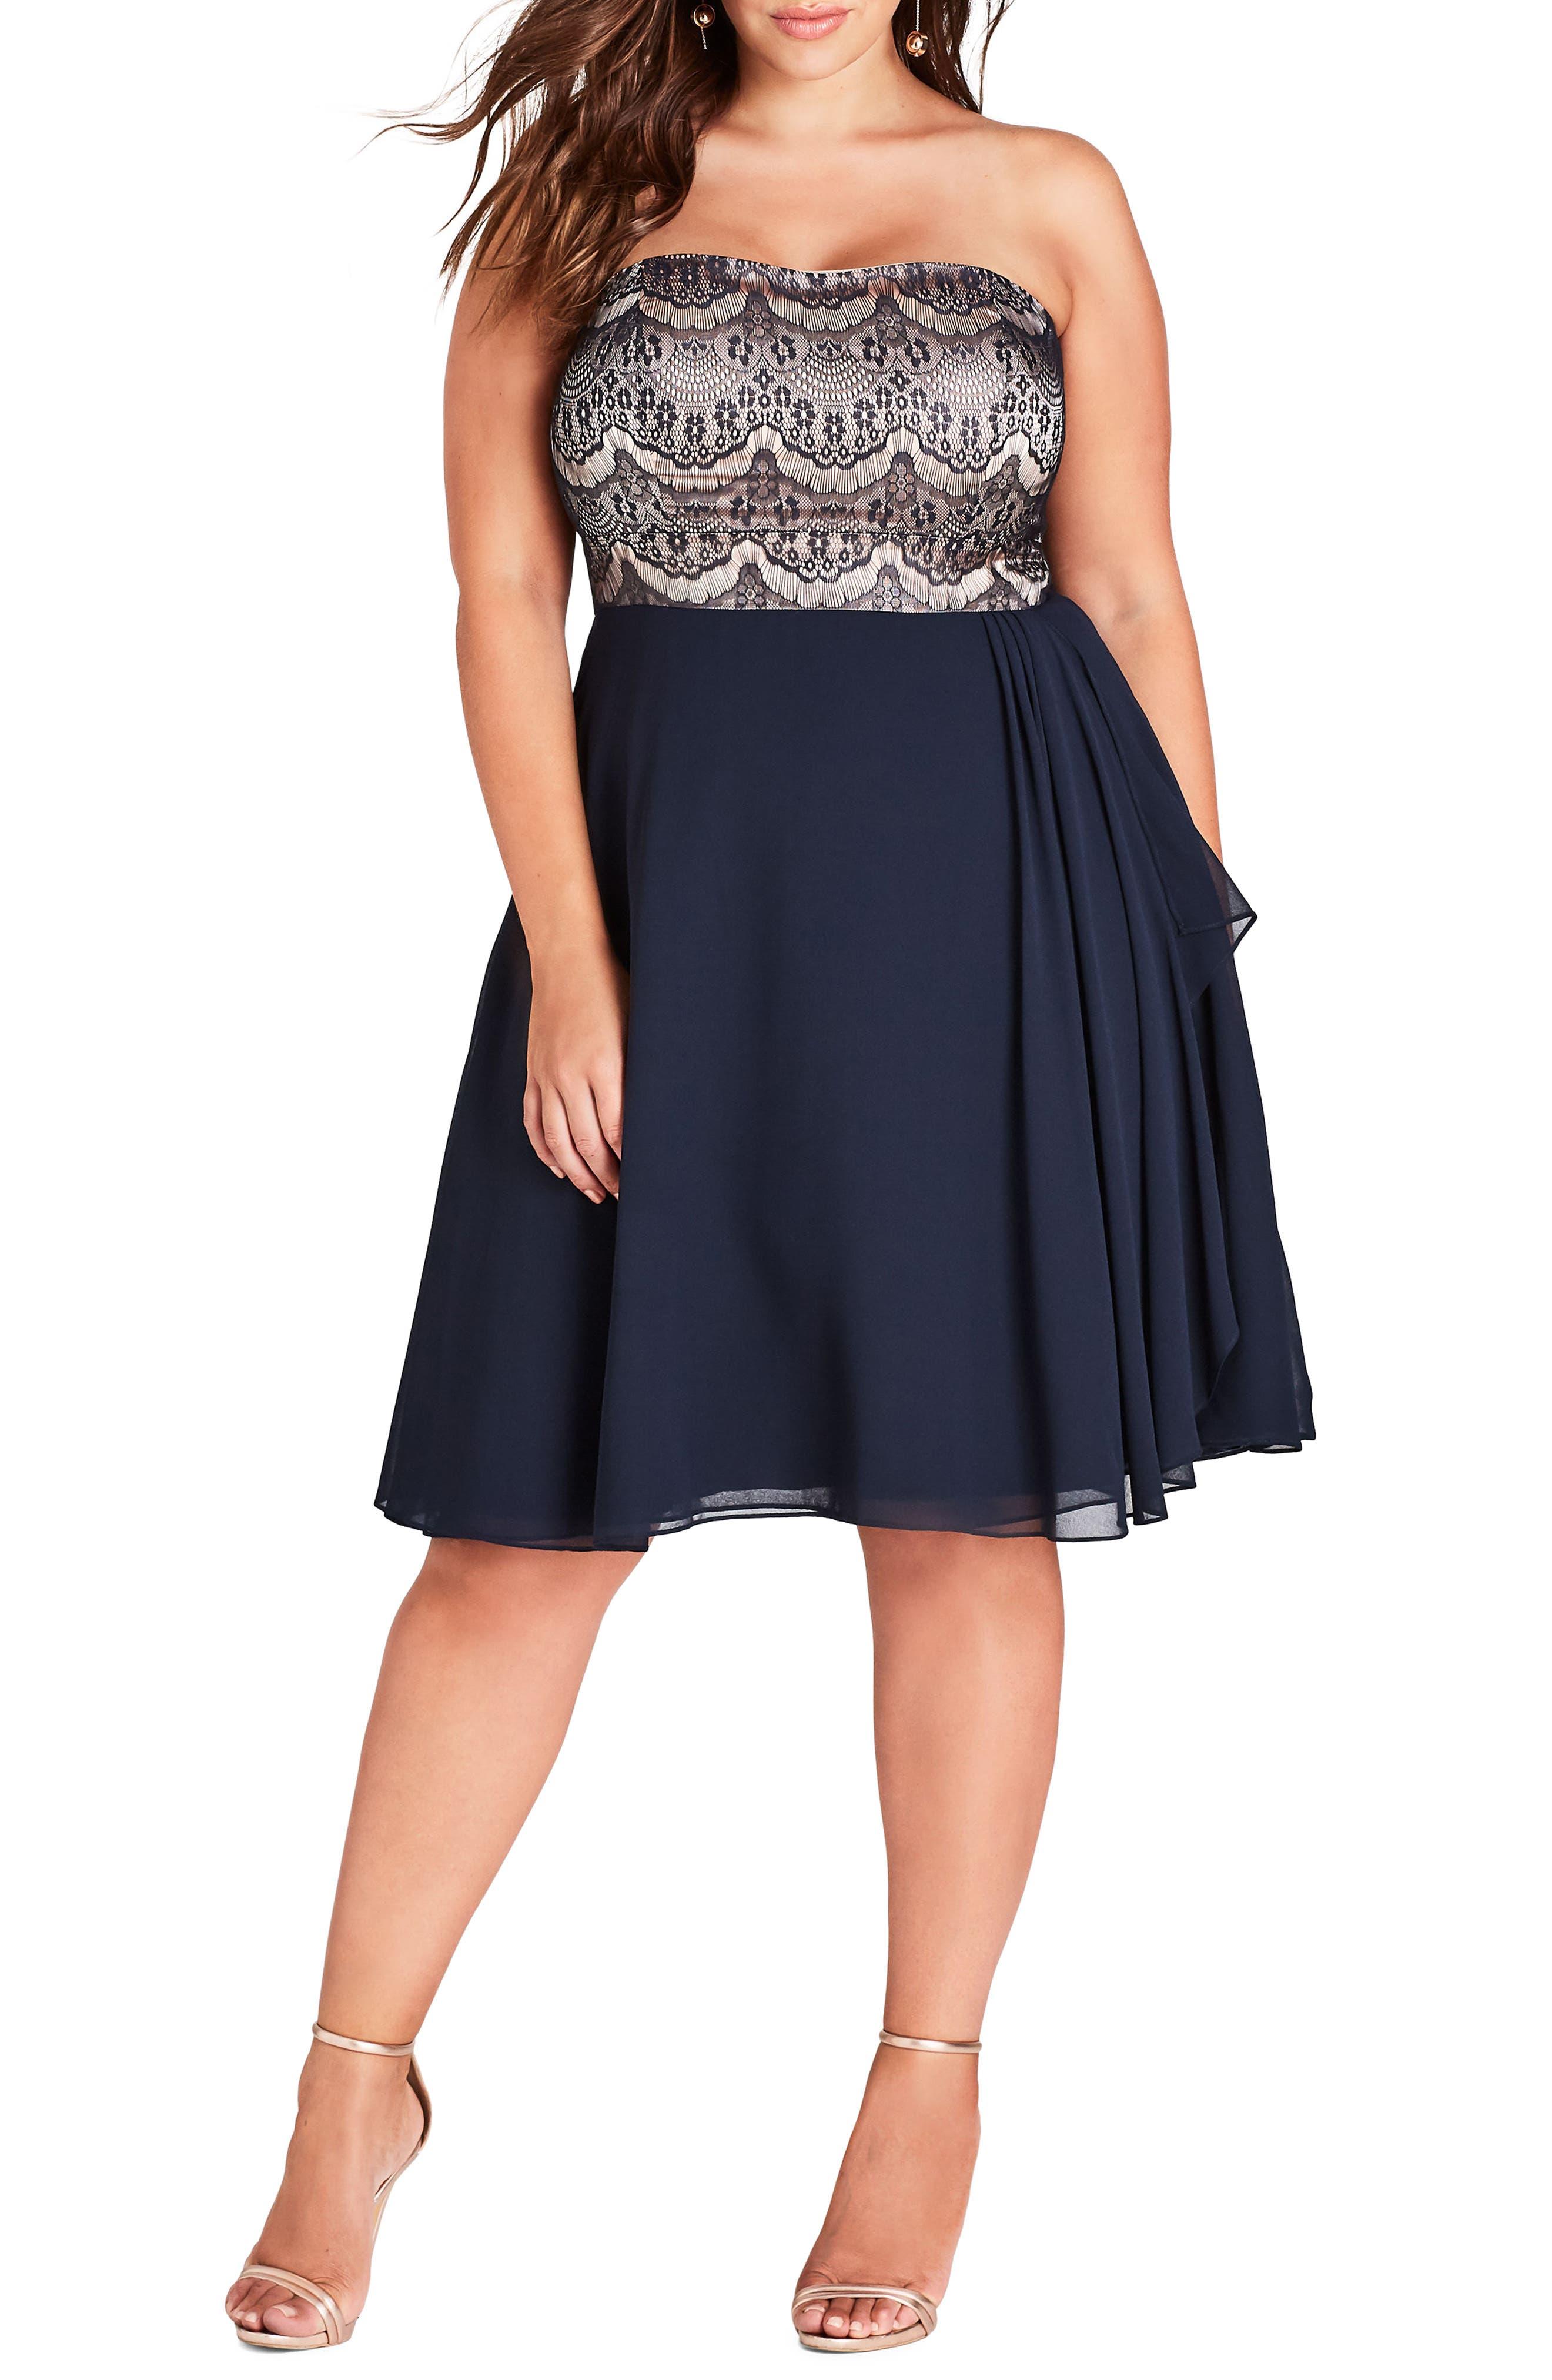 Eyelash Ebony Strapless Fit & Flare Dress,                             Main thumbnail 1, color,                             NAVY